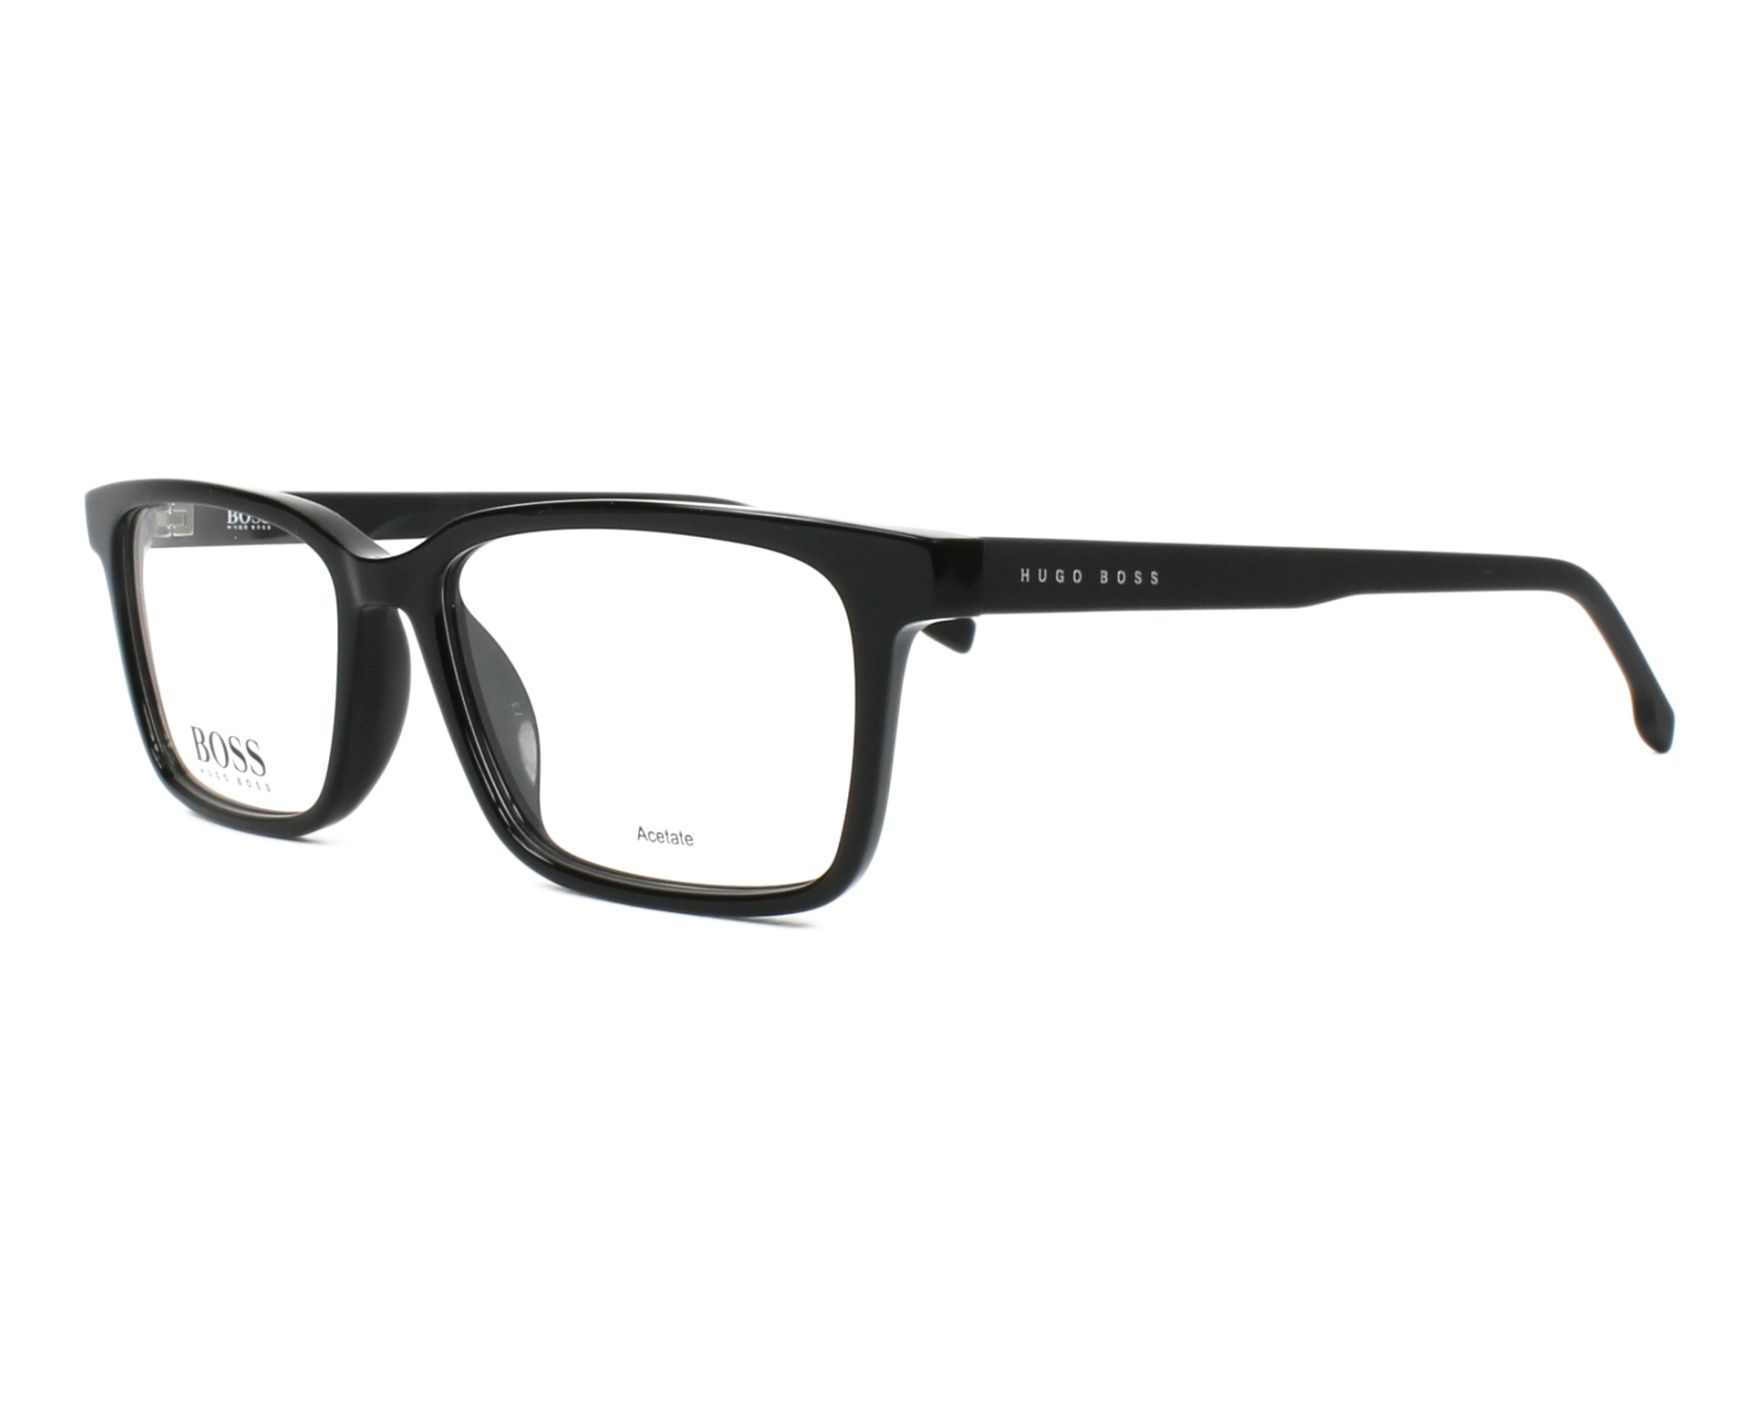 5465d962a97 eyeglasses Hugo Boss BOSS-0924 807 51-15 Black Black profile view